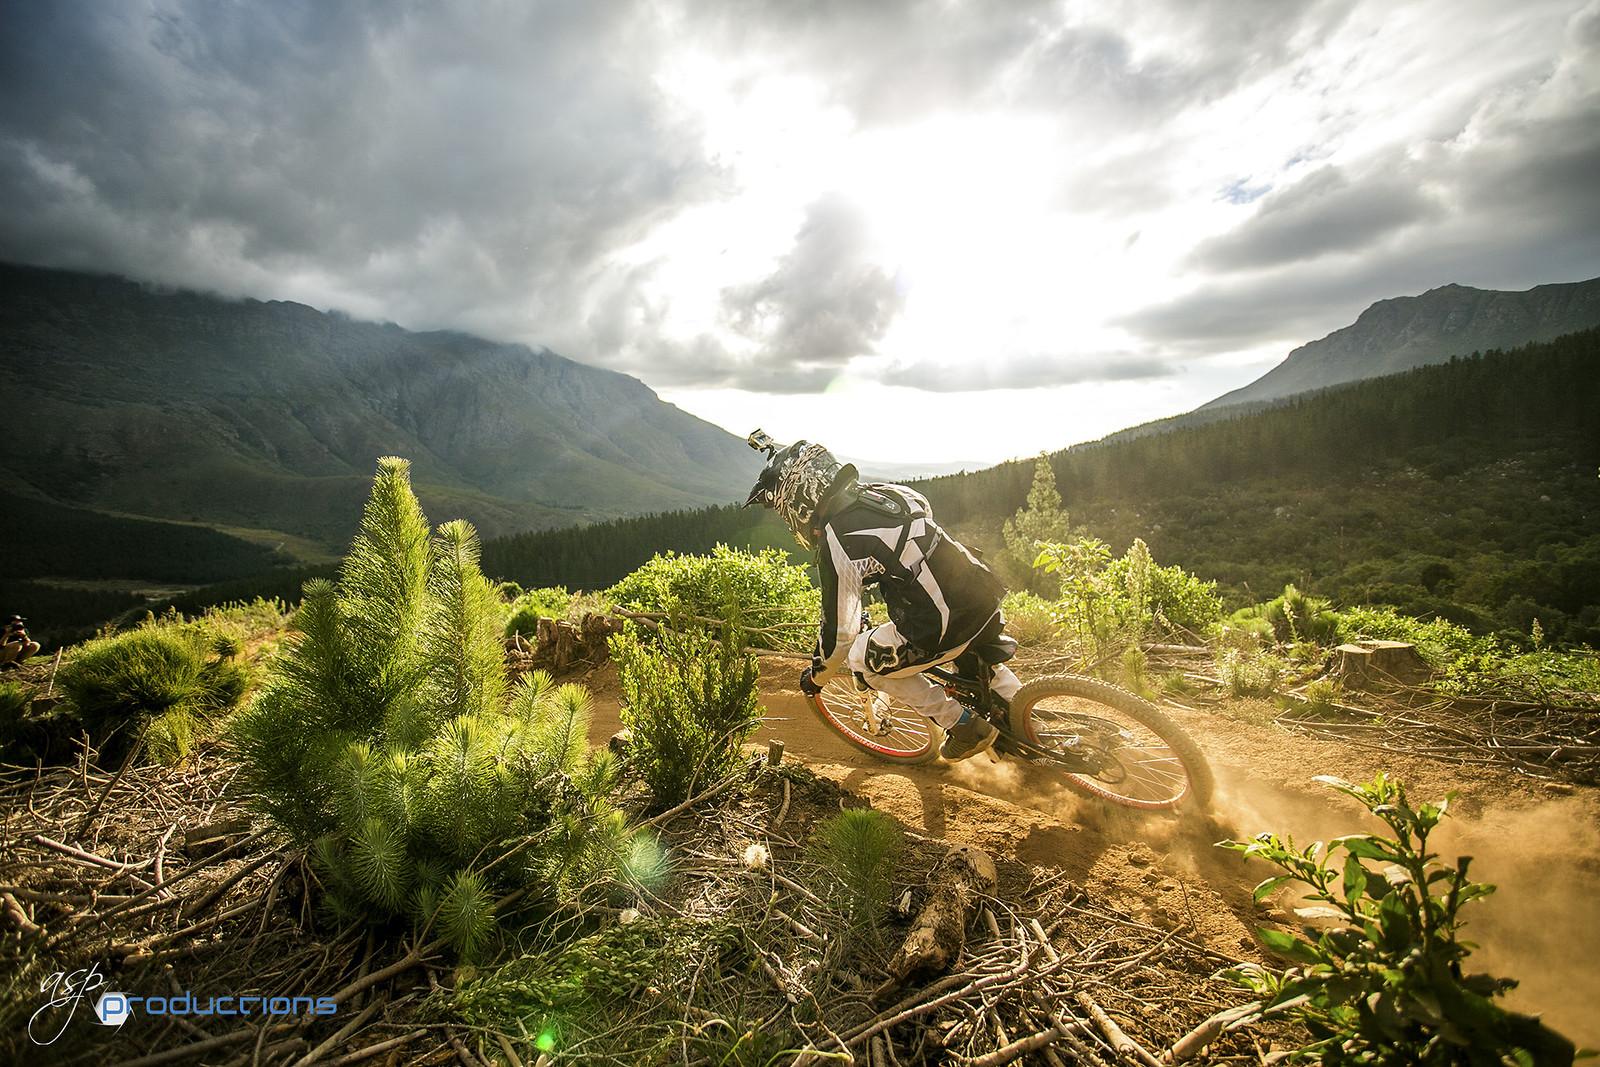 Jonkershoek Race Line - Alexbsearle - Mountain Biking Pictures - Vital MTB